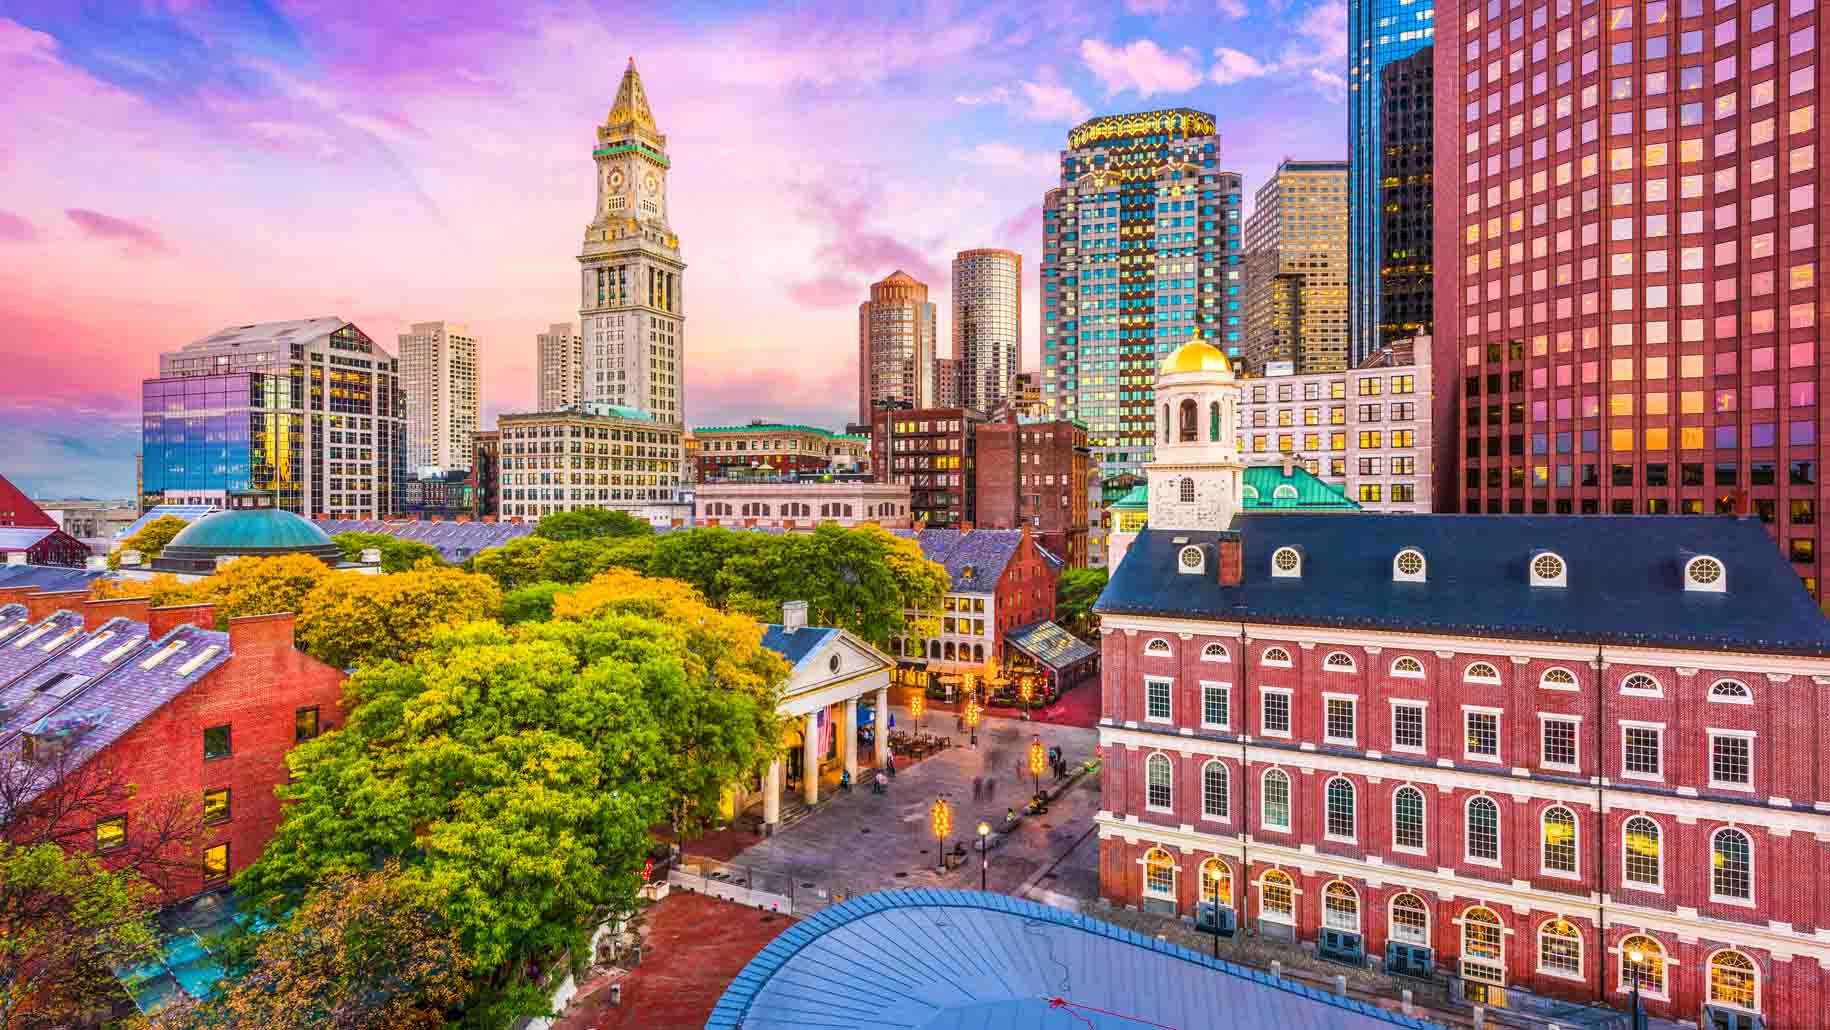 Boston historic skyline at dusk.